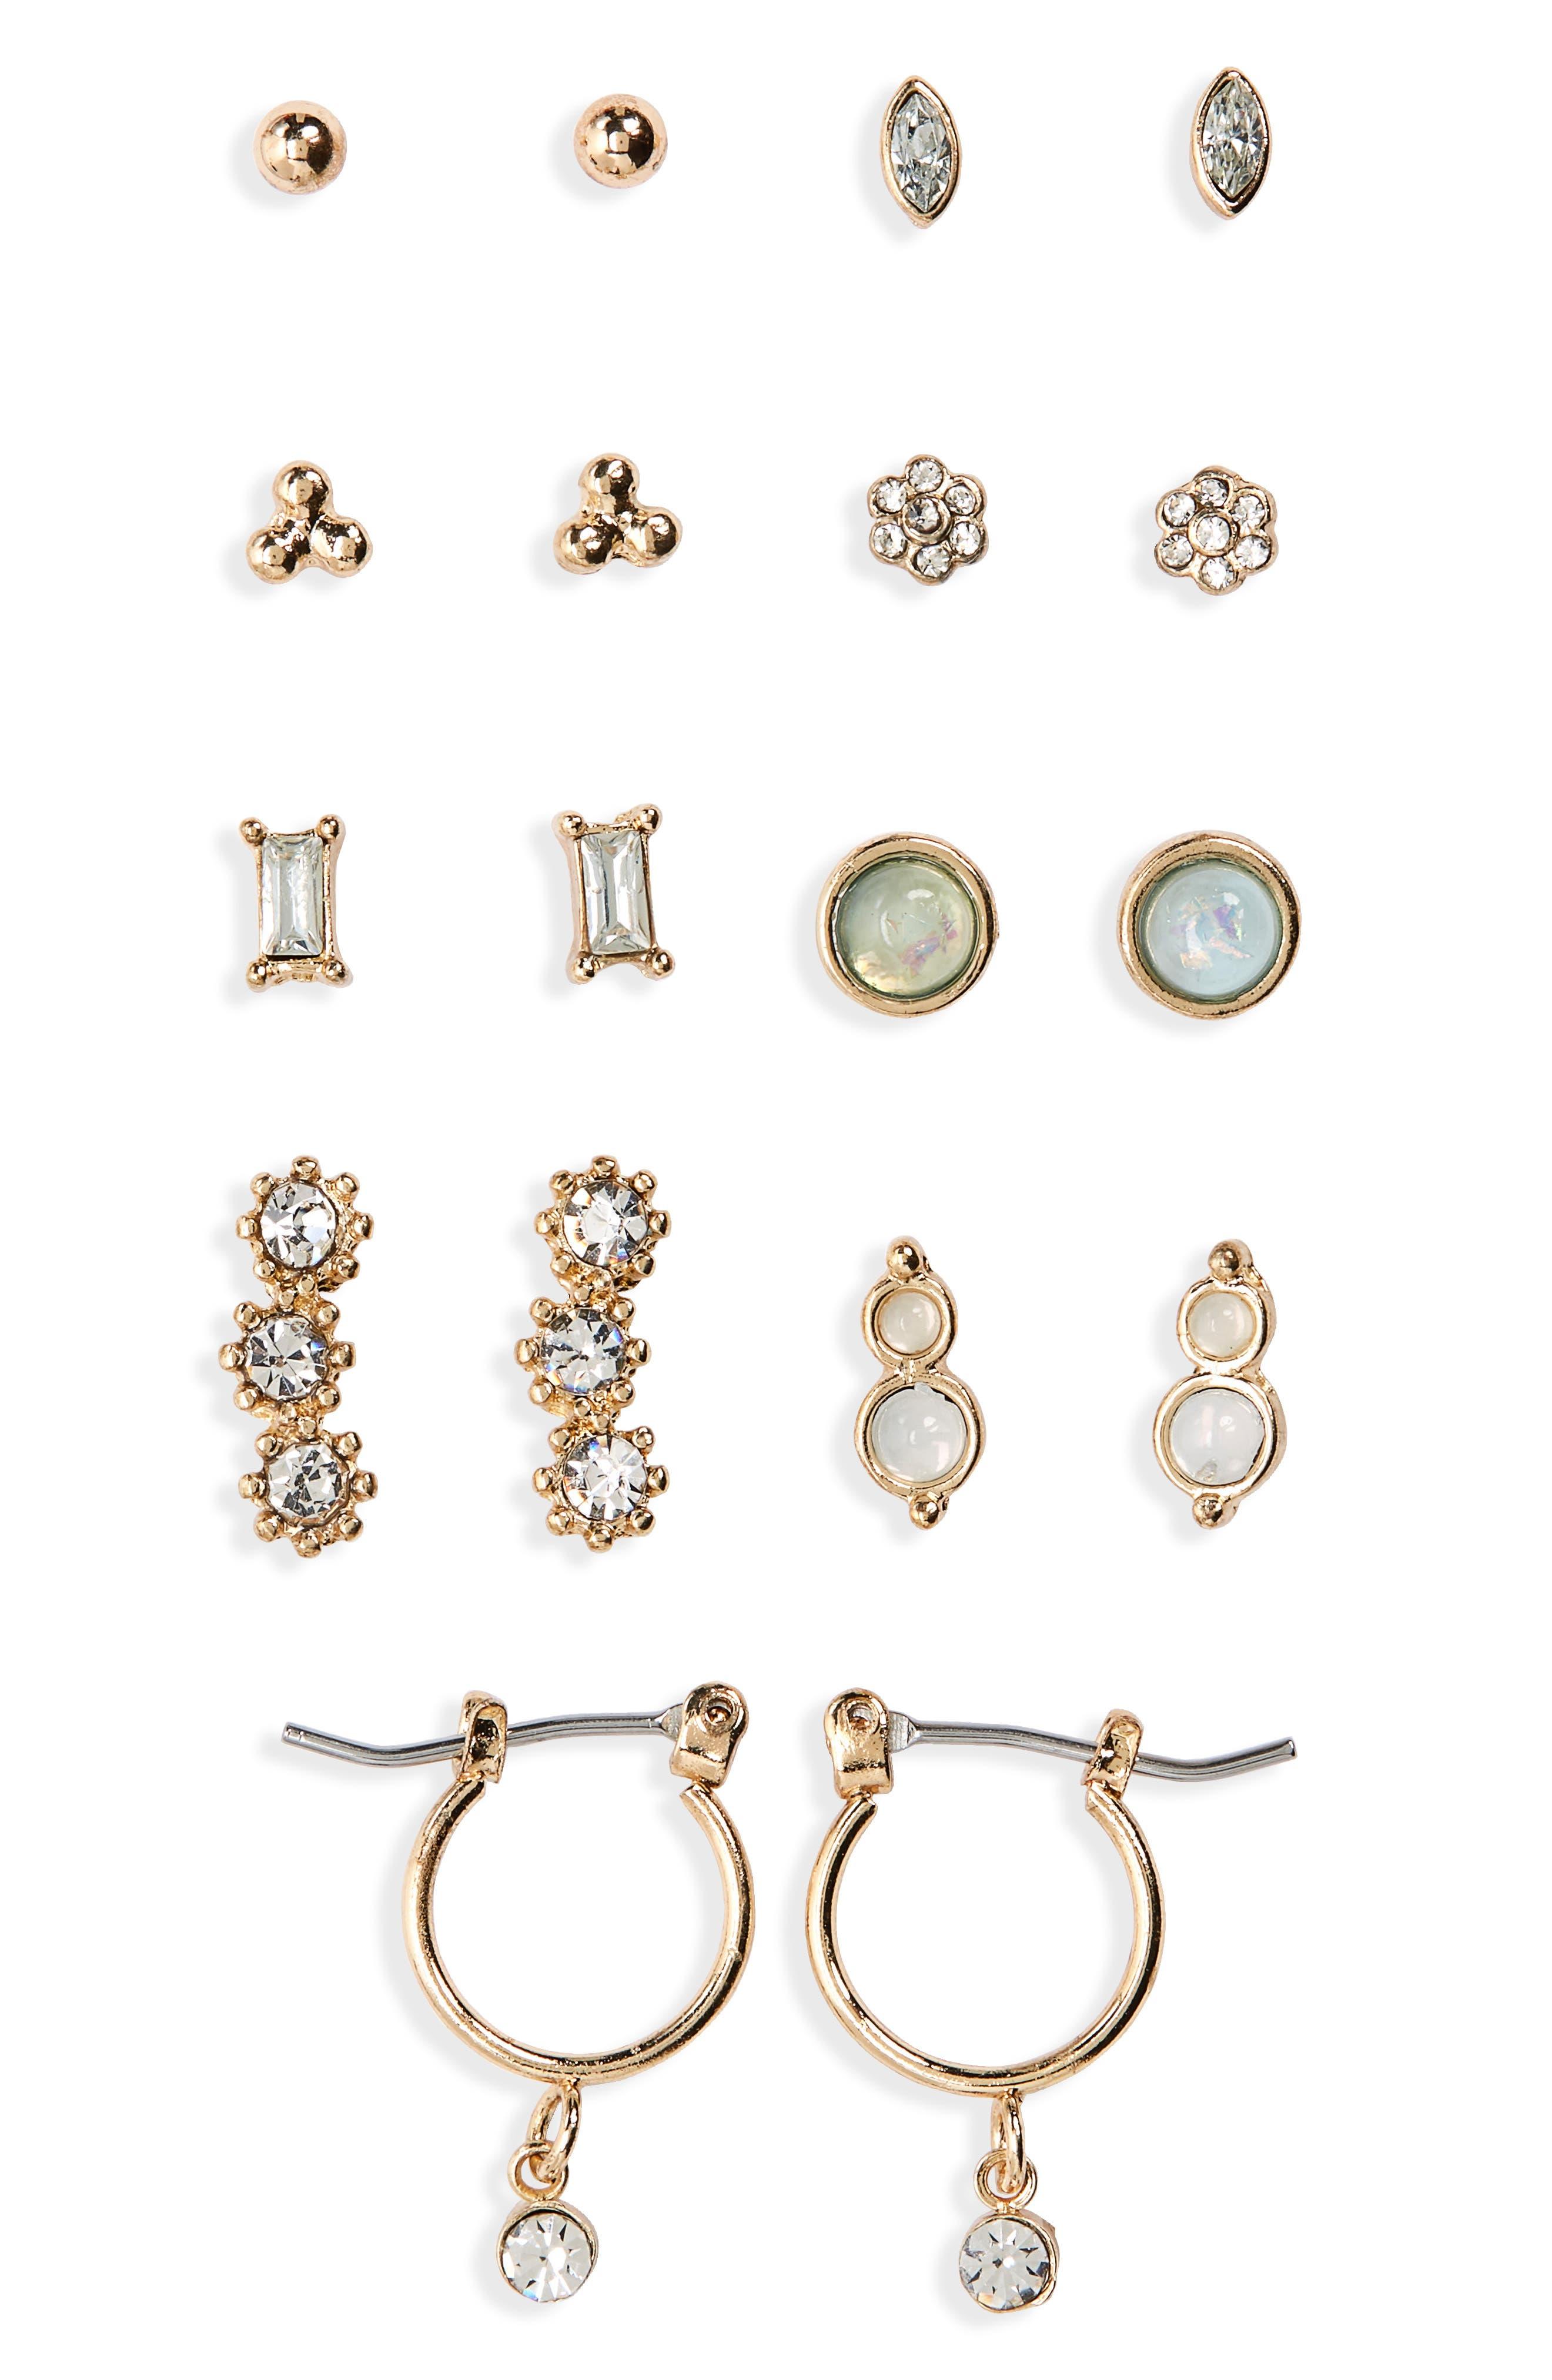 9-Pack Crystal Earrings,                         Main,                         color, GOLD/ MULTI